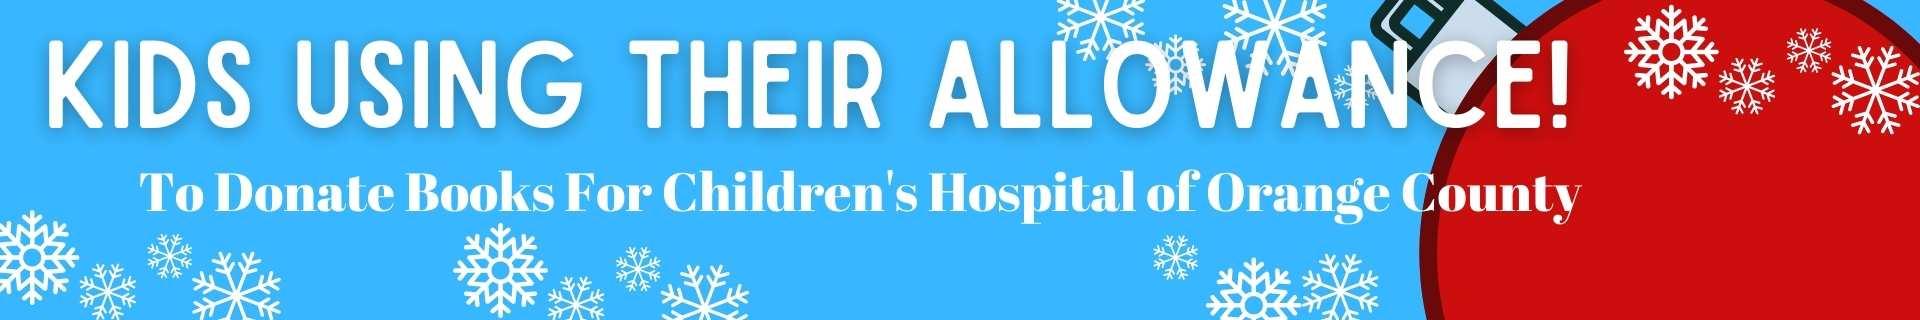 kids donating books for childrens hospitals